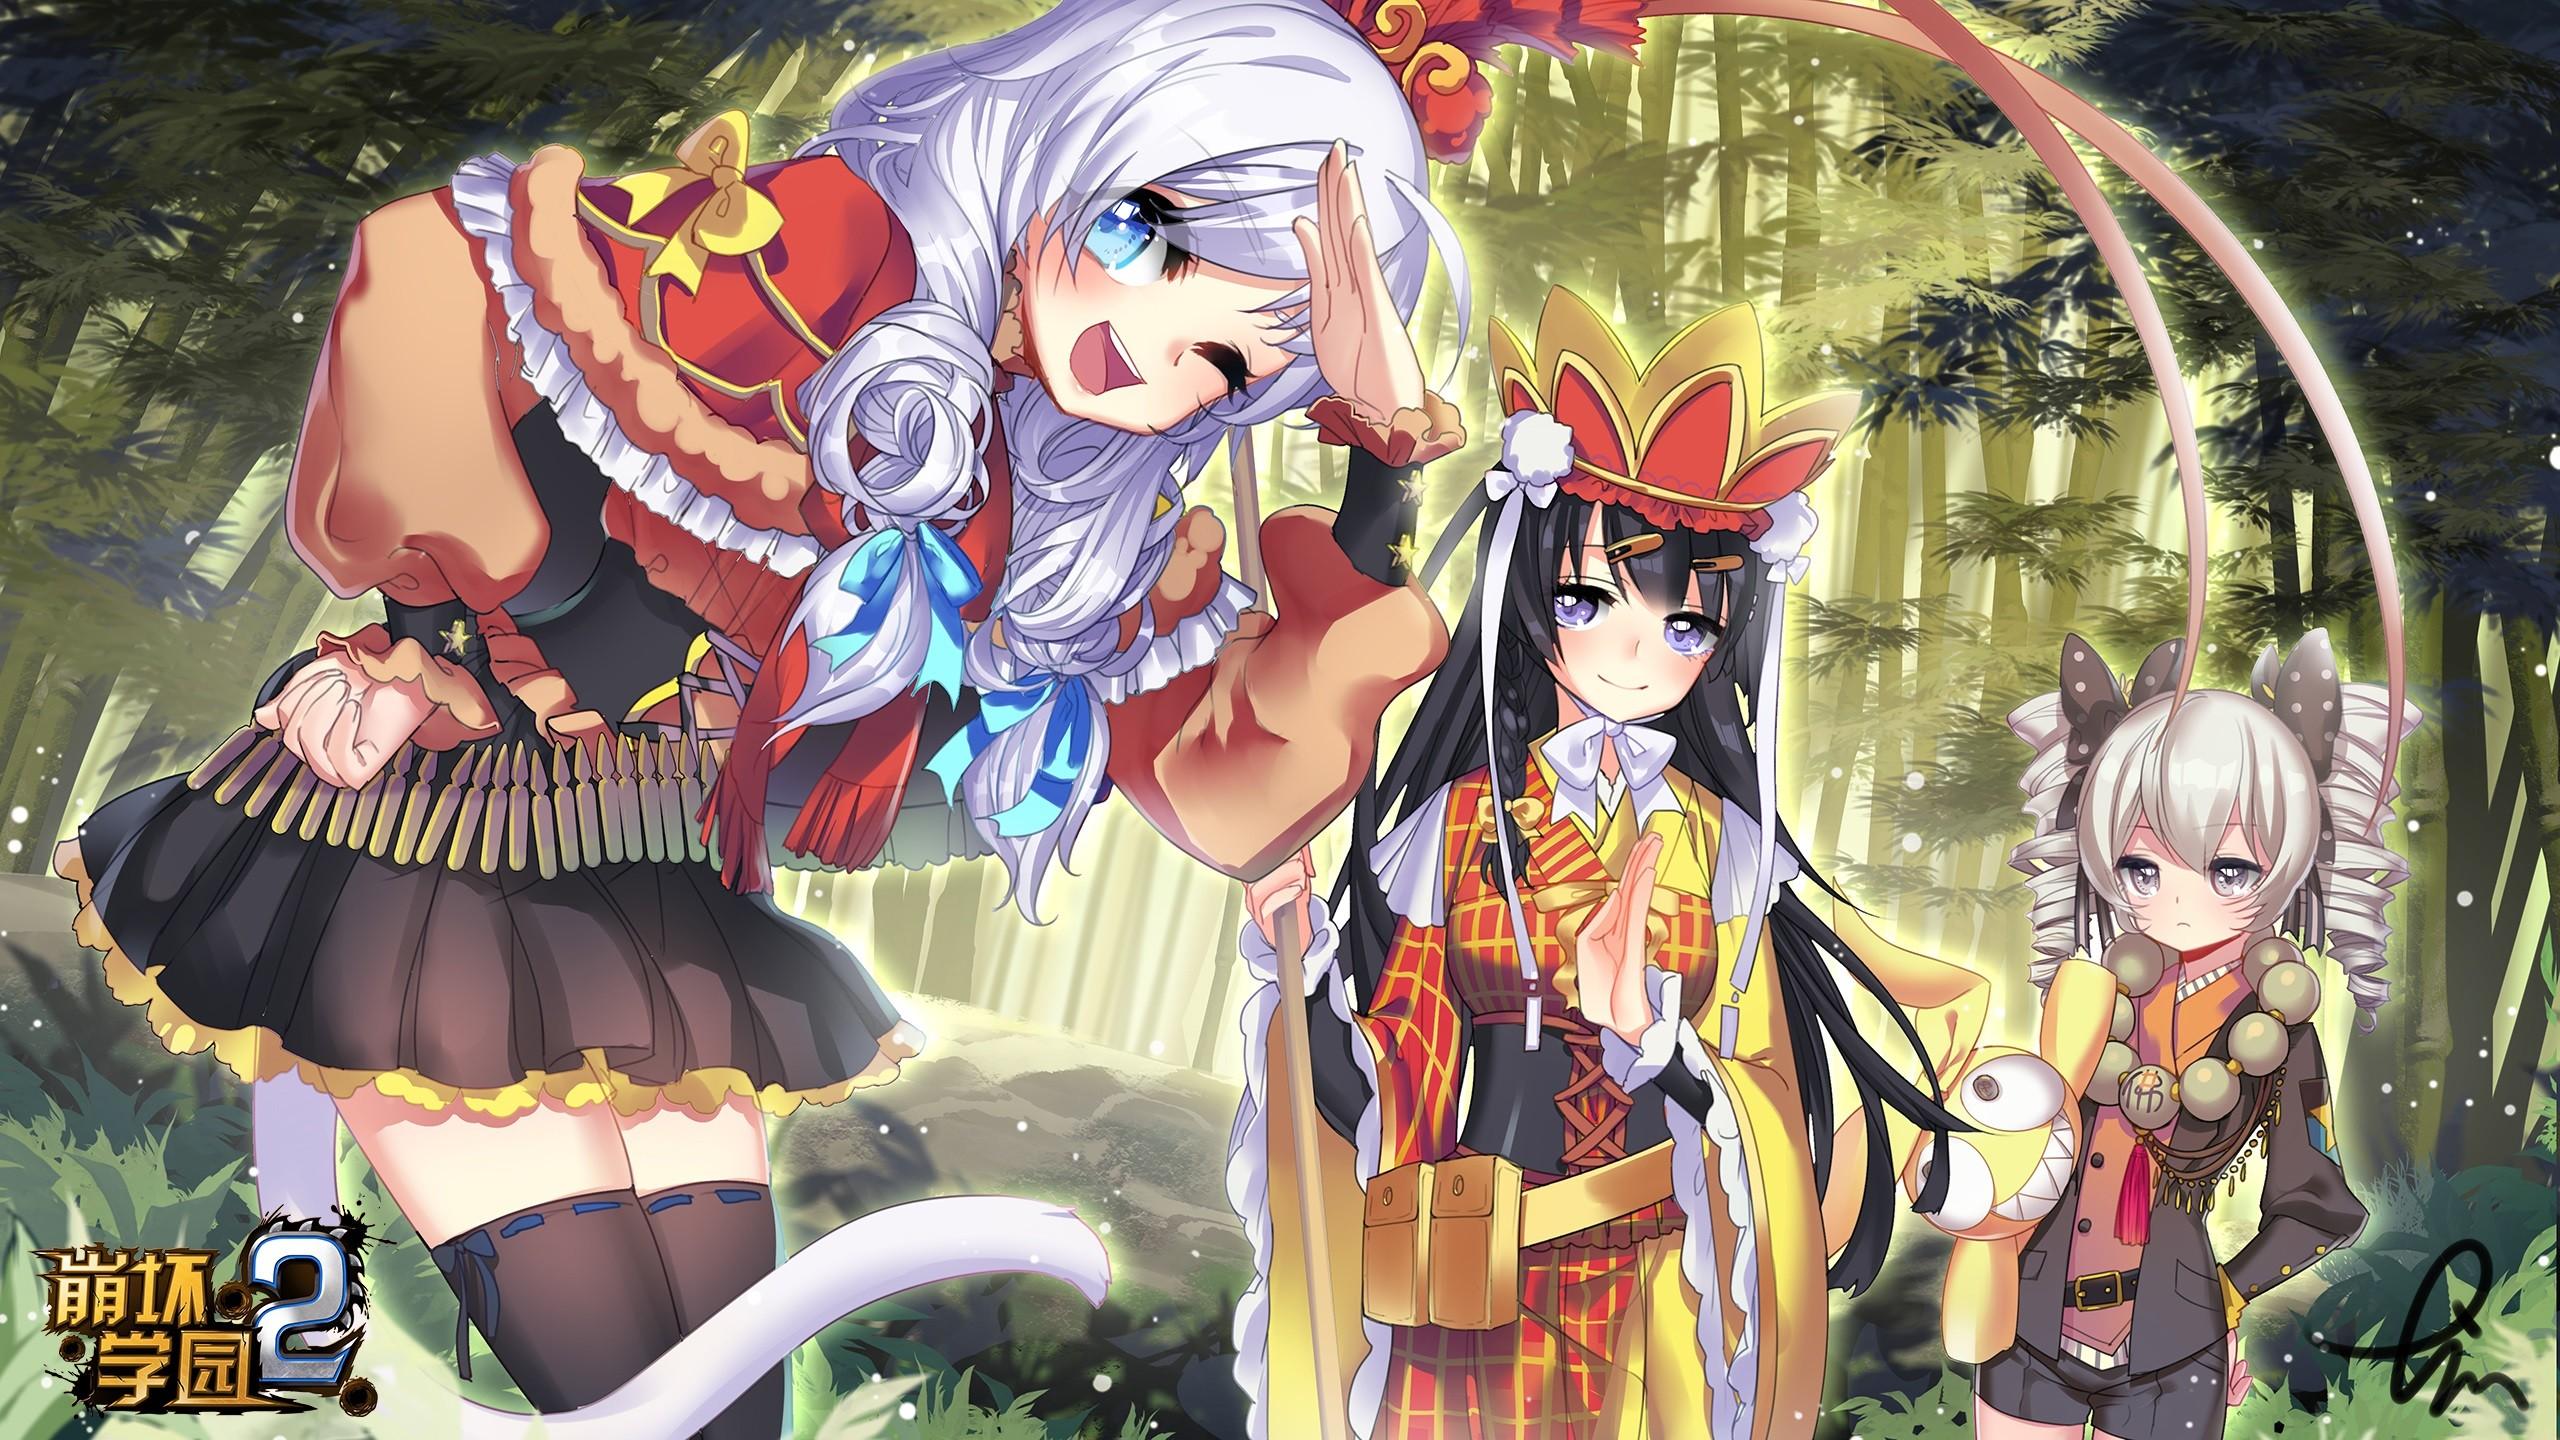 Anime 2560x1440 Guns GirlZ Houkai Gakuen Kiana Kaslana Raiden Mei Bronya Zaychik anime girls skirt stockings